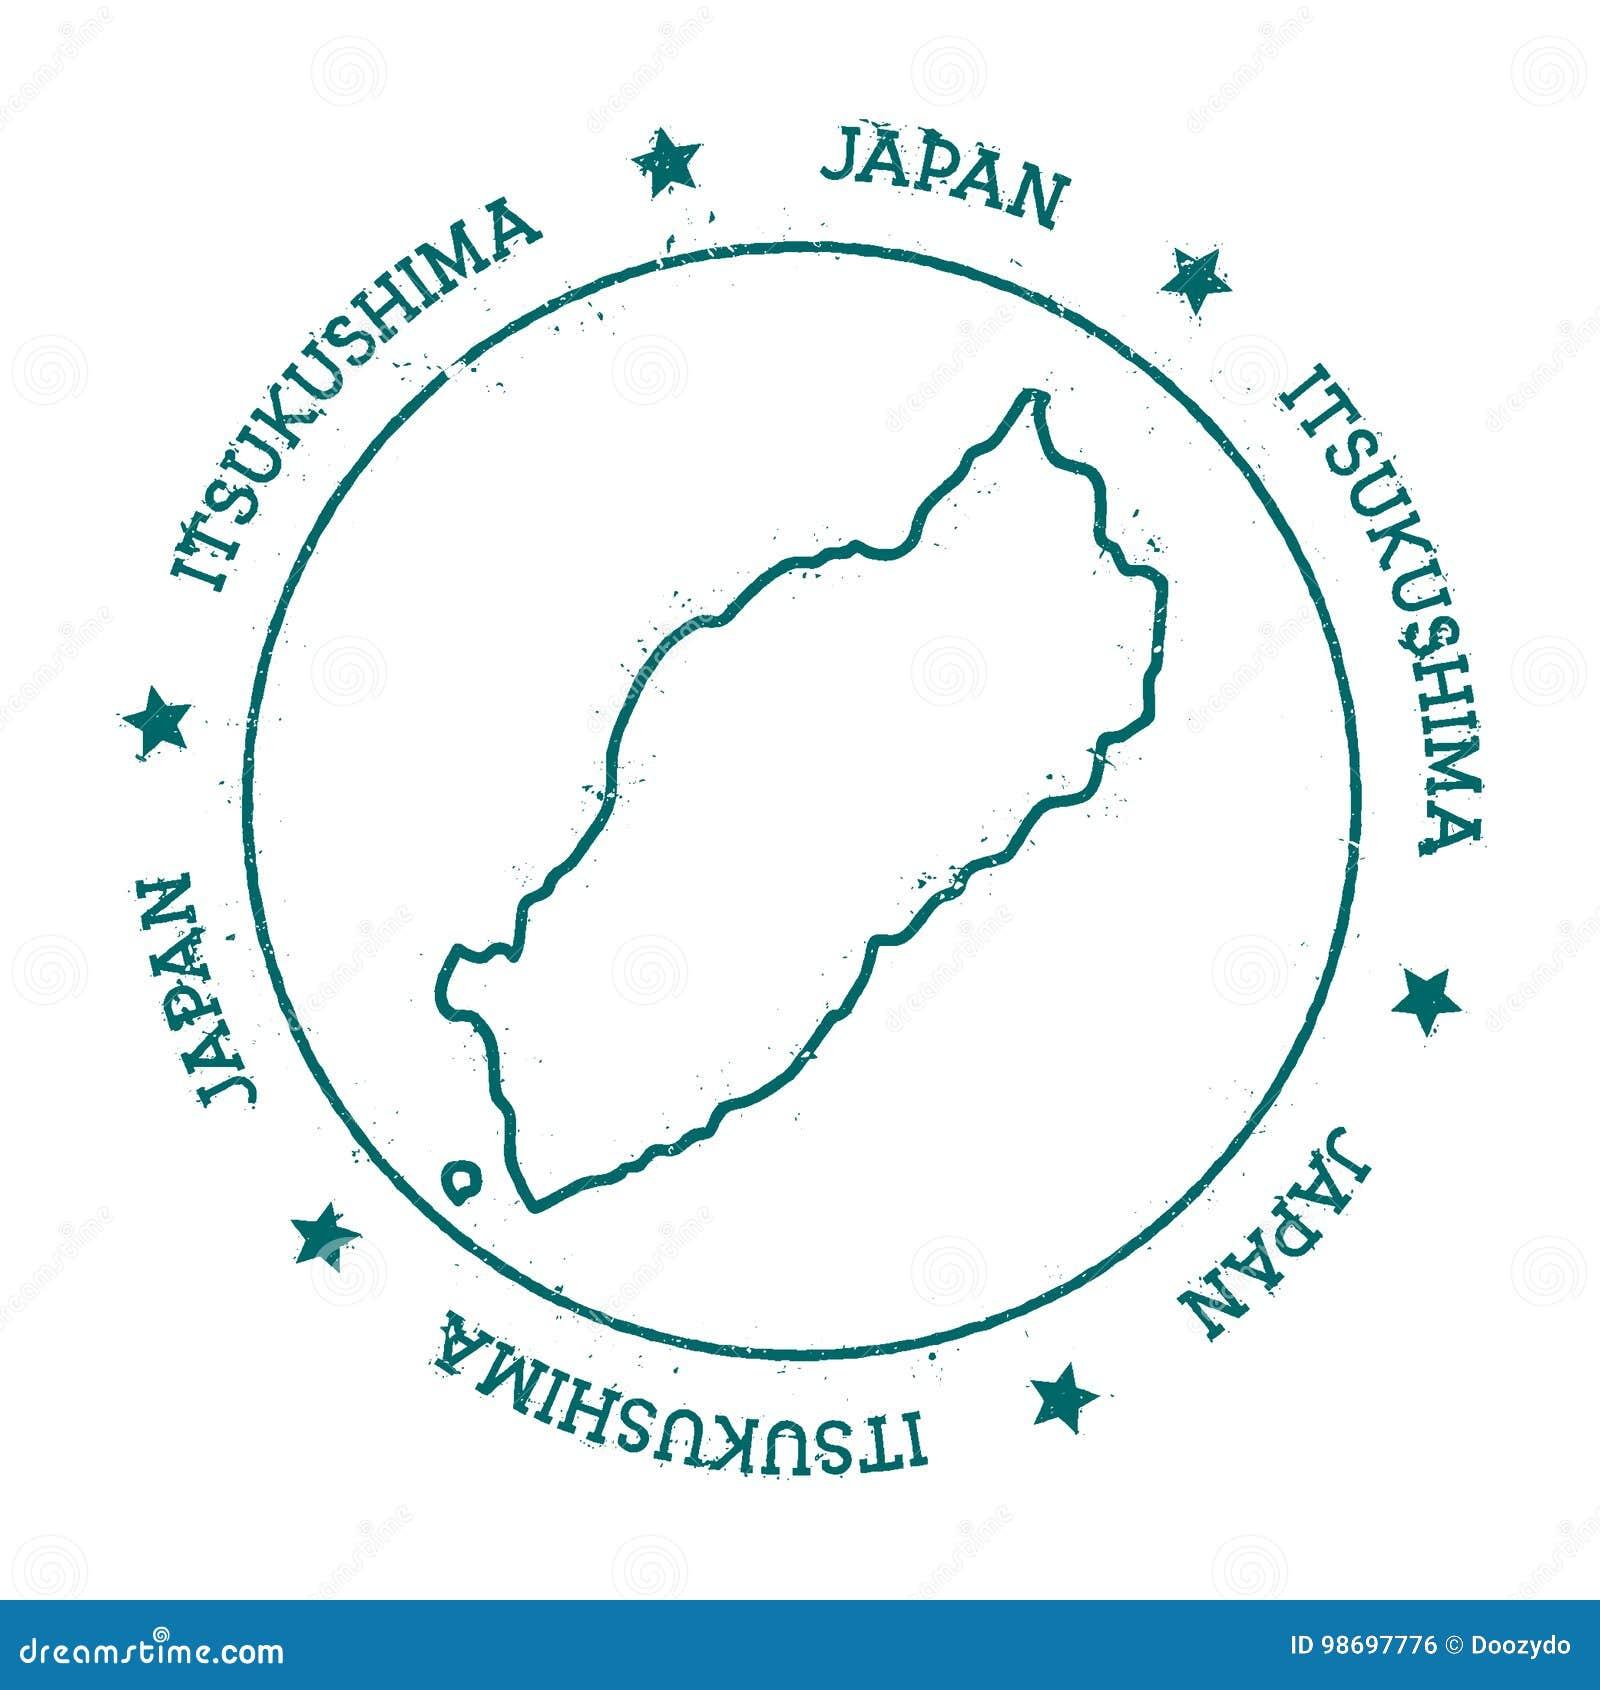 Itsukushima vector map stock vector Illustration of international